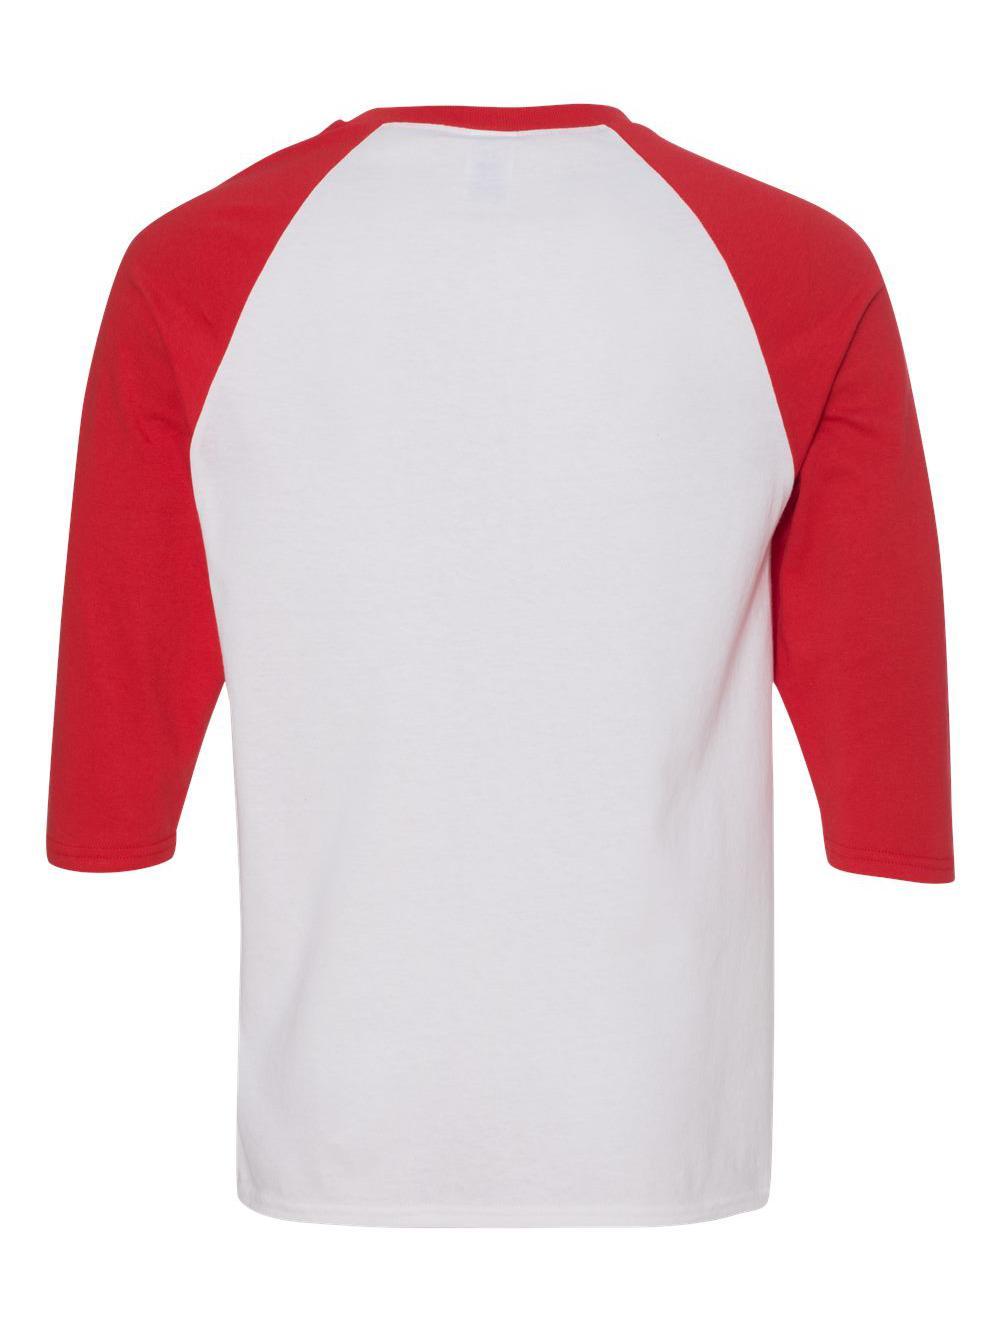 Gildan-Heavy-Cotton-Three-Quarter-Raglan-Sleeve-Baseball-T-Shirt-5700 thumbnail 40